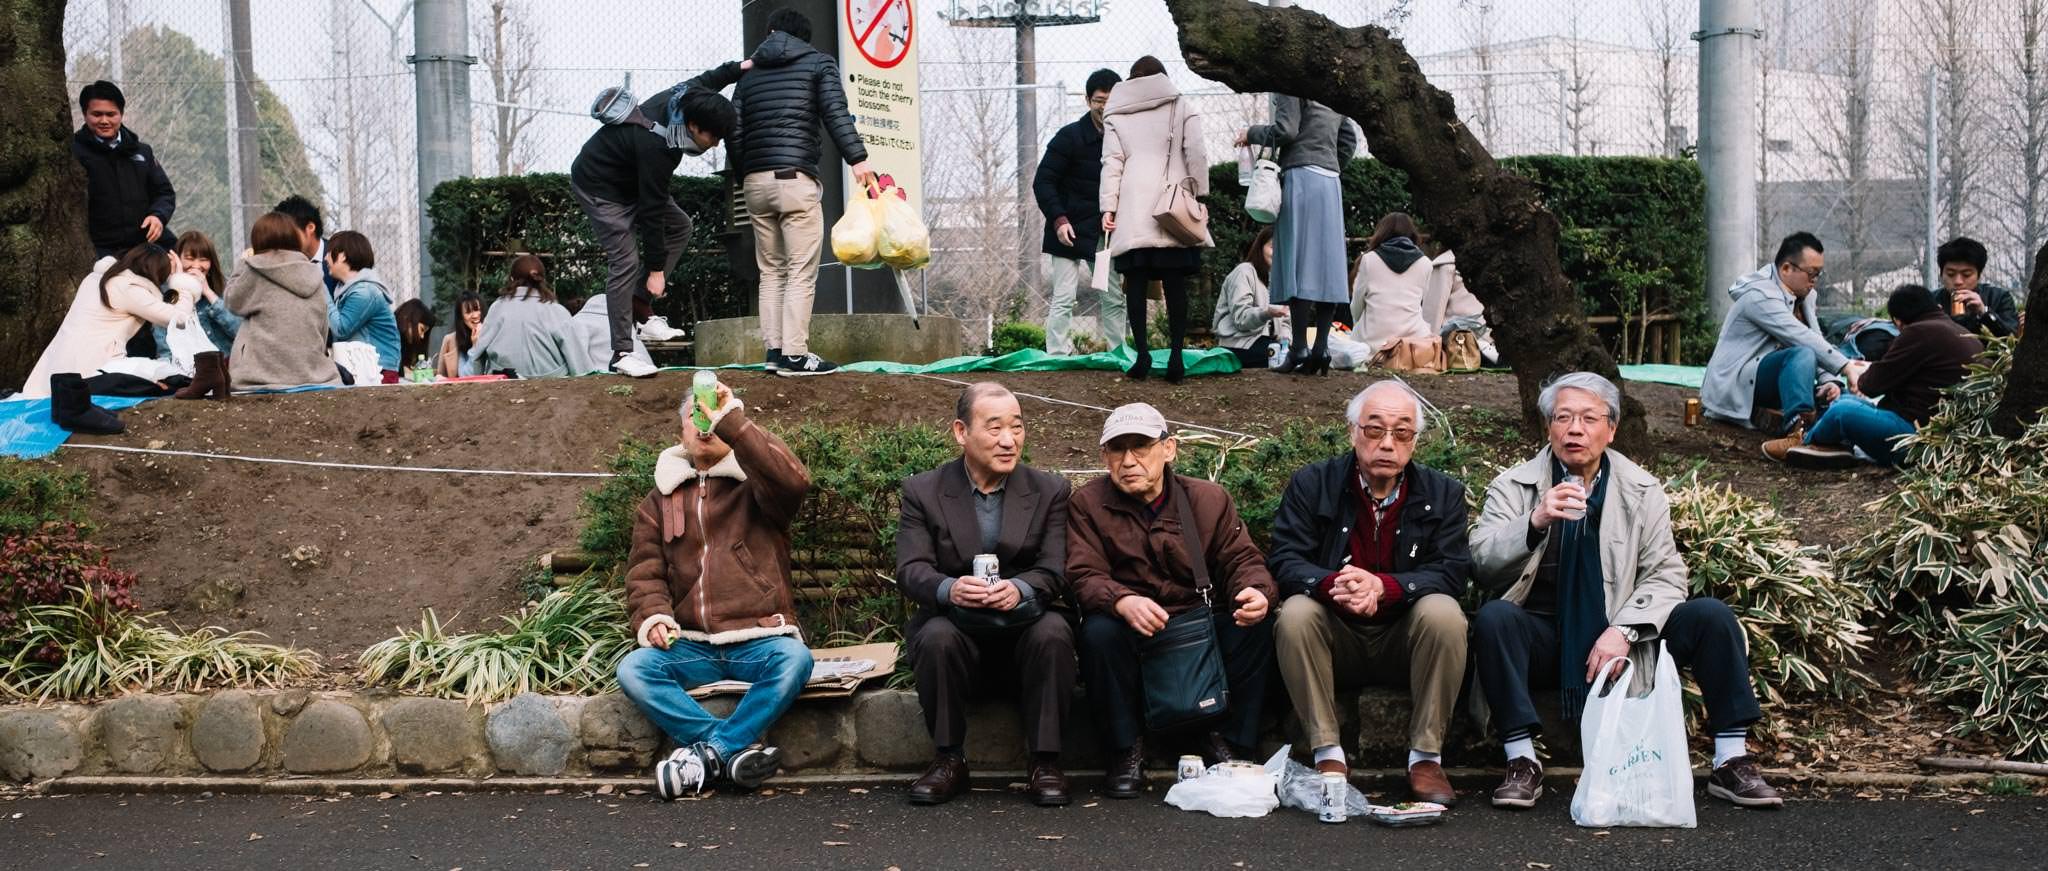 chris_eberhardt_japan_travel_reise_nippon-7.jpg